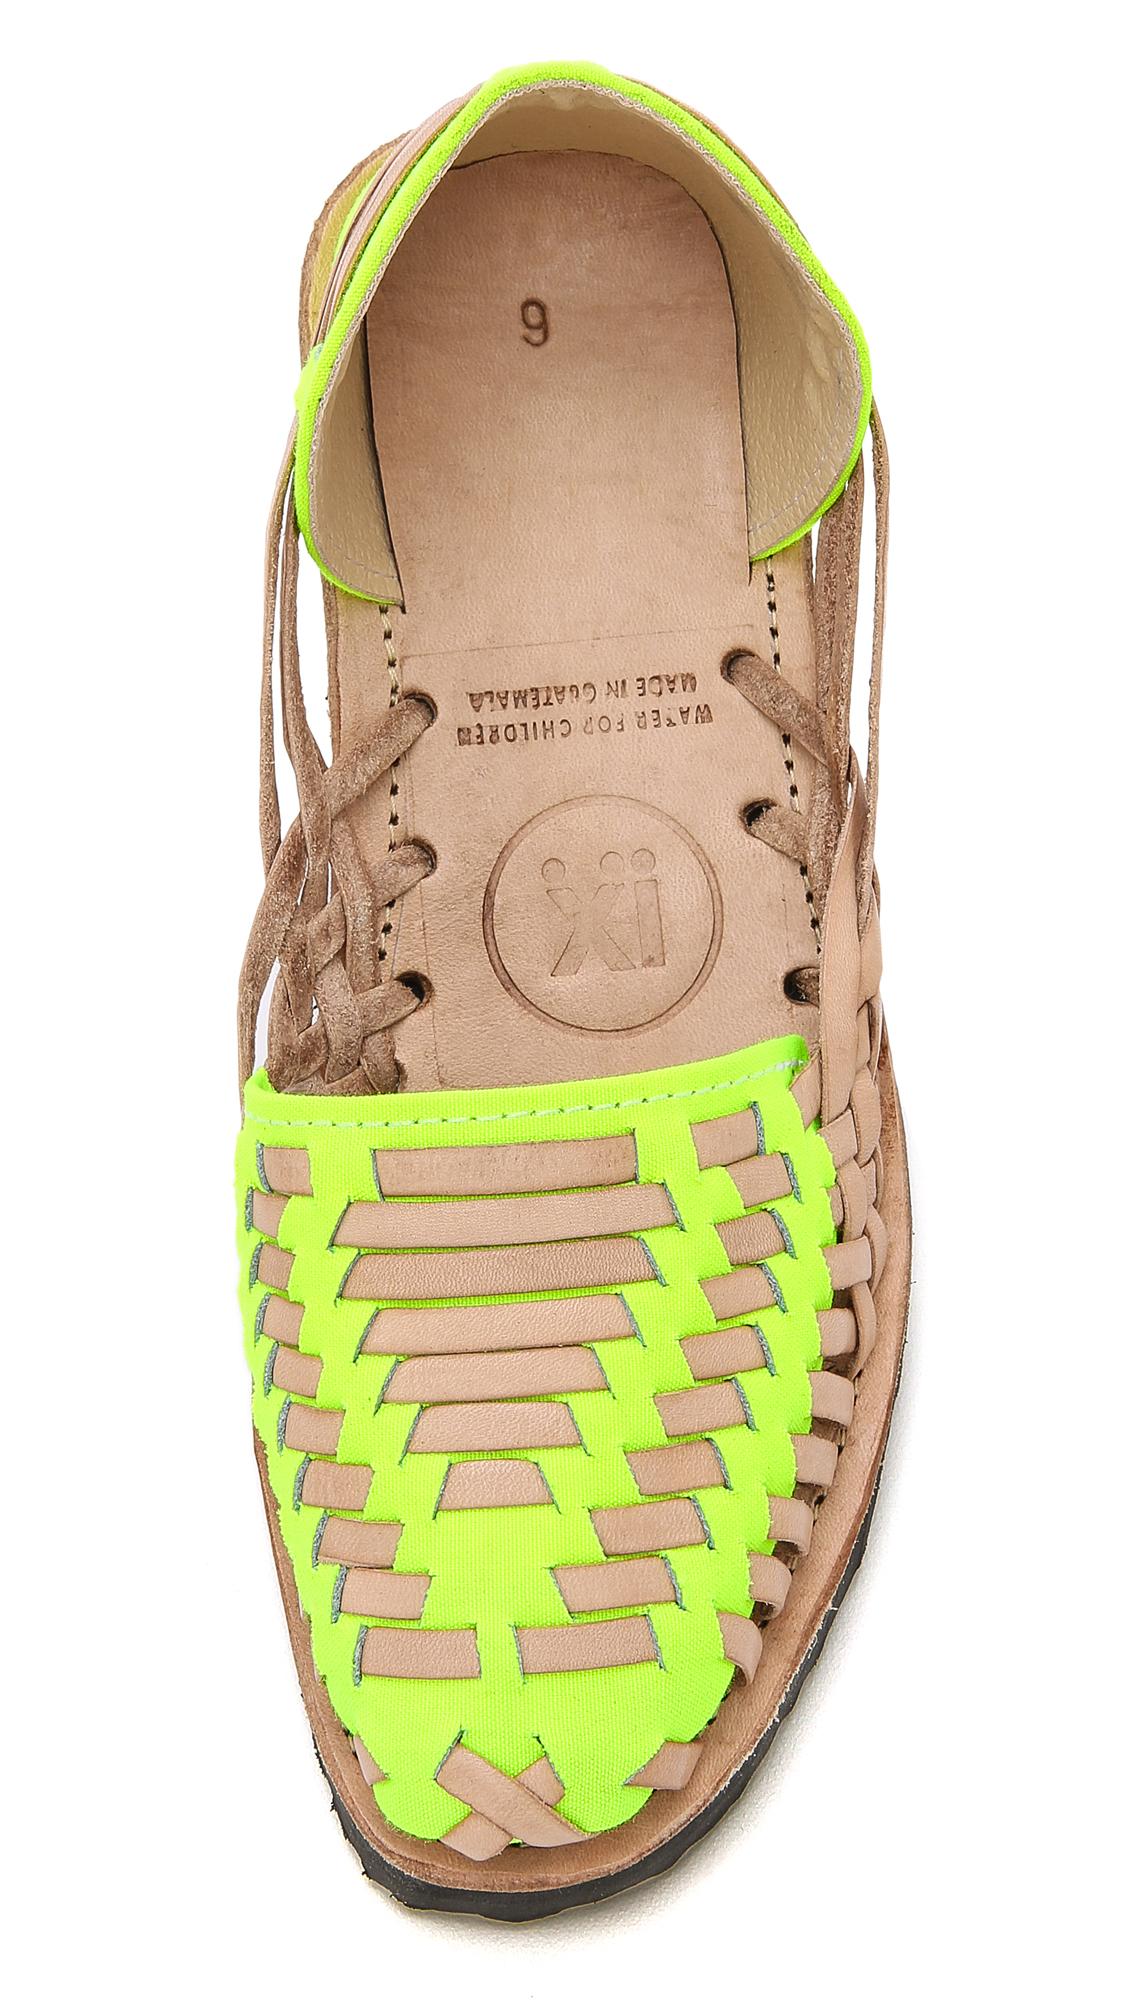 4b7611aa7faf Ix Style Woven Leather Huarache Flats - Yellow Neon in Yellow - Lyst